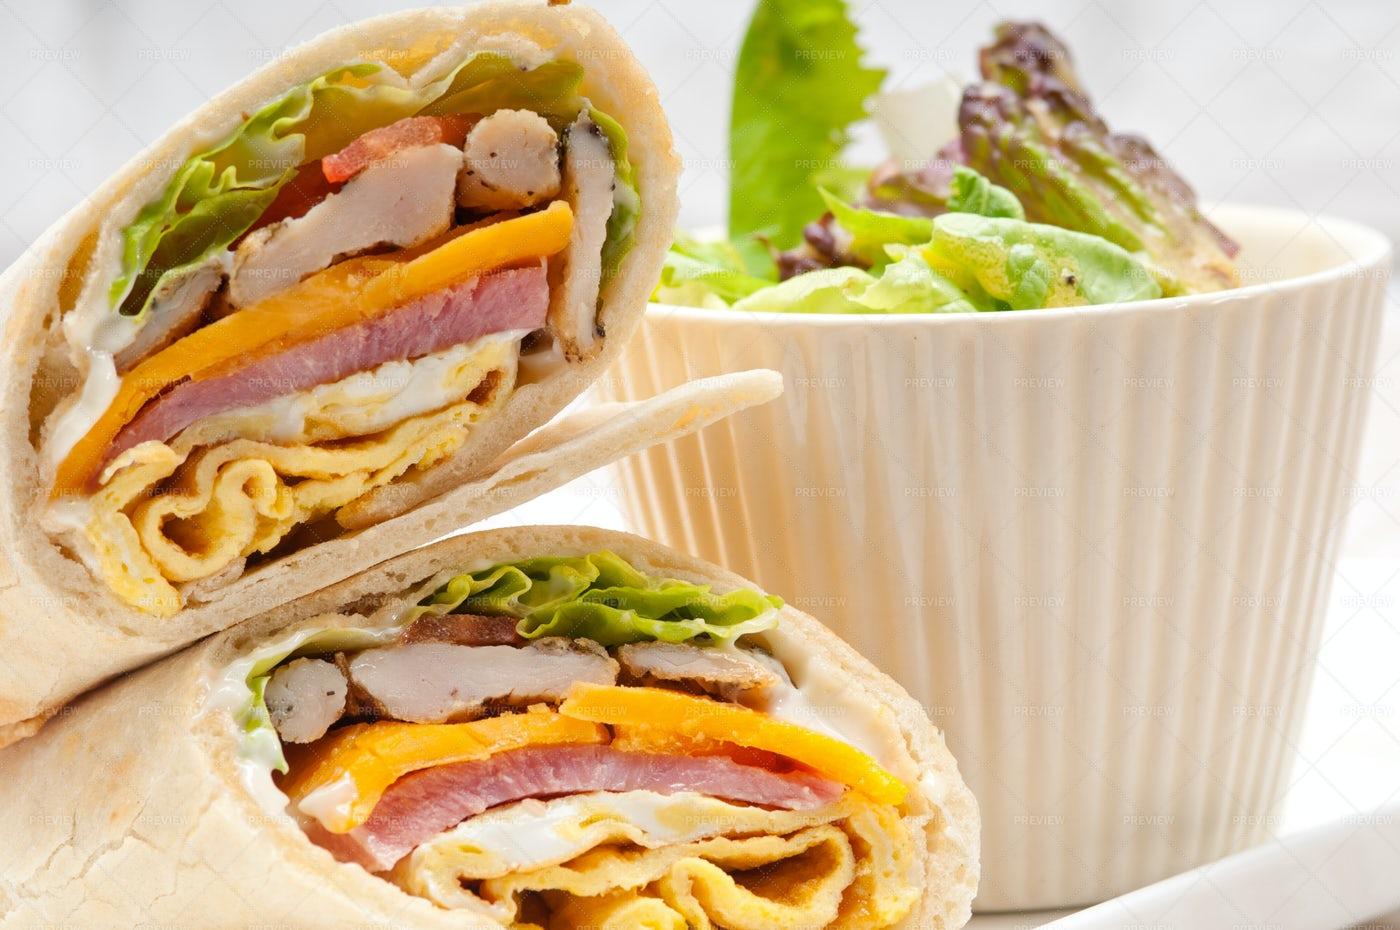 Tasty Burrito: Stock Photos